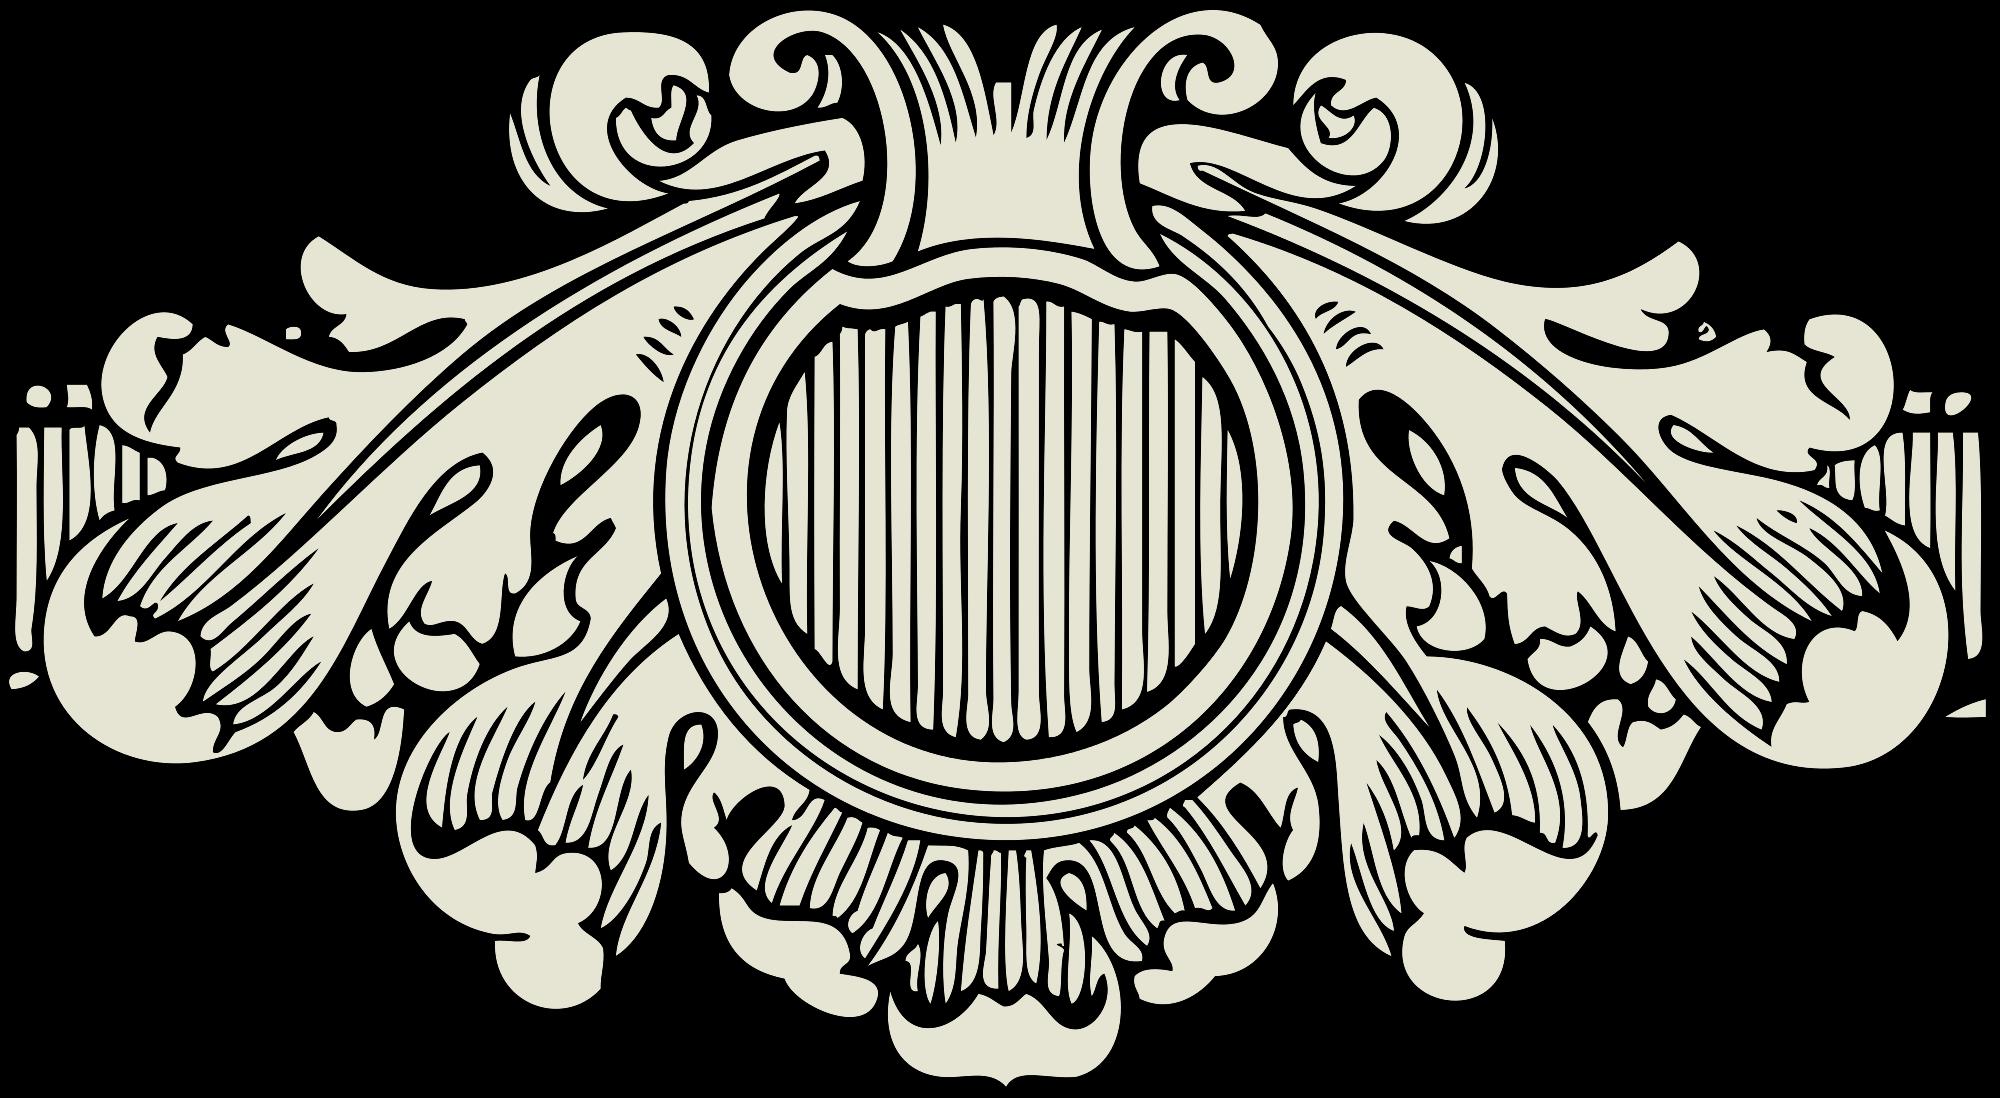 Svg wikimedia commons open. Flourish clipart file